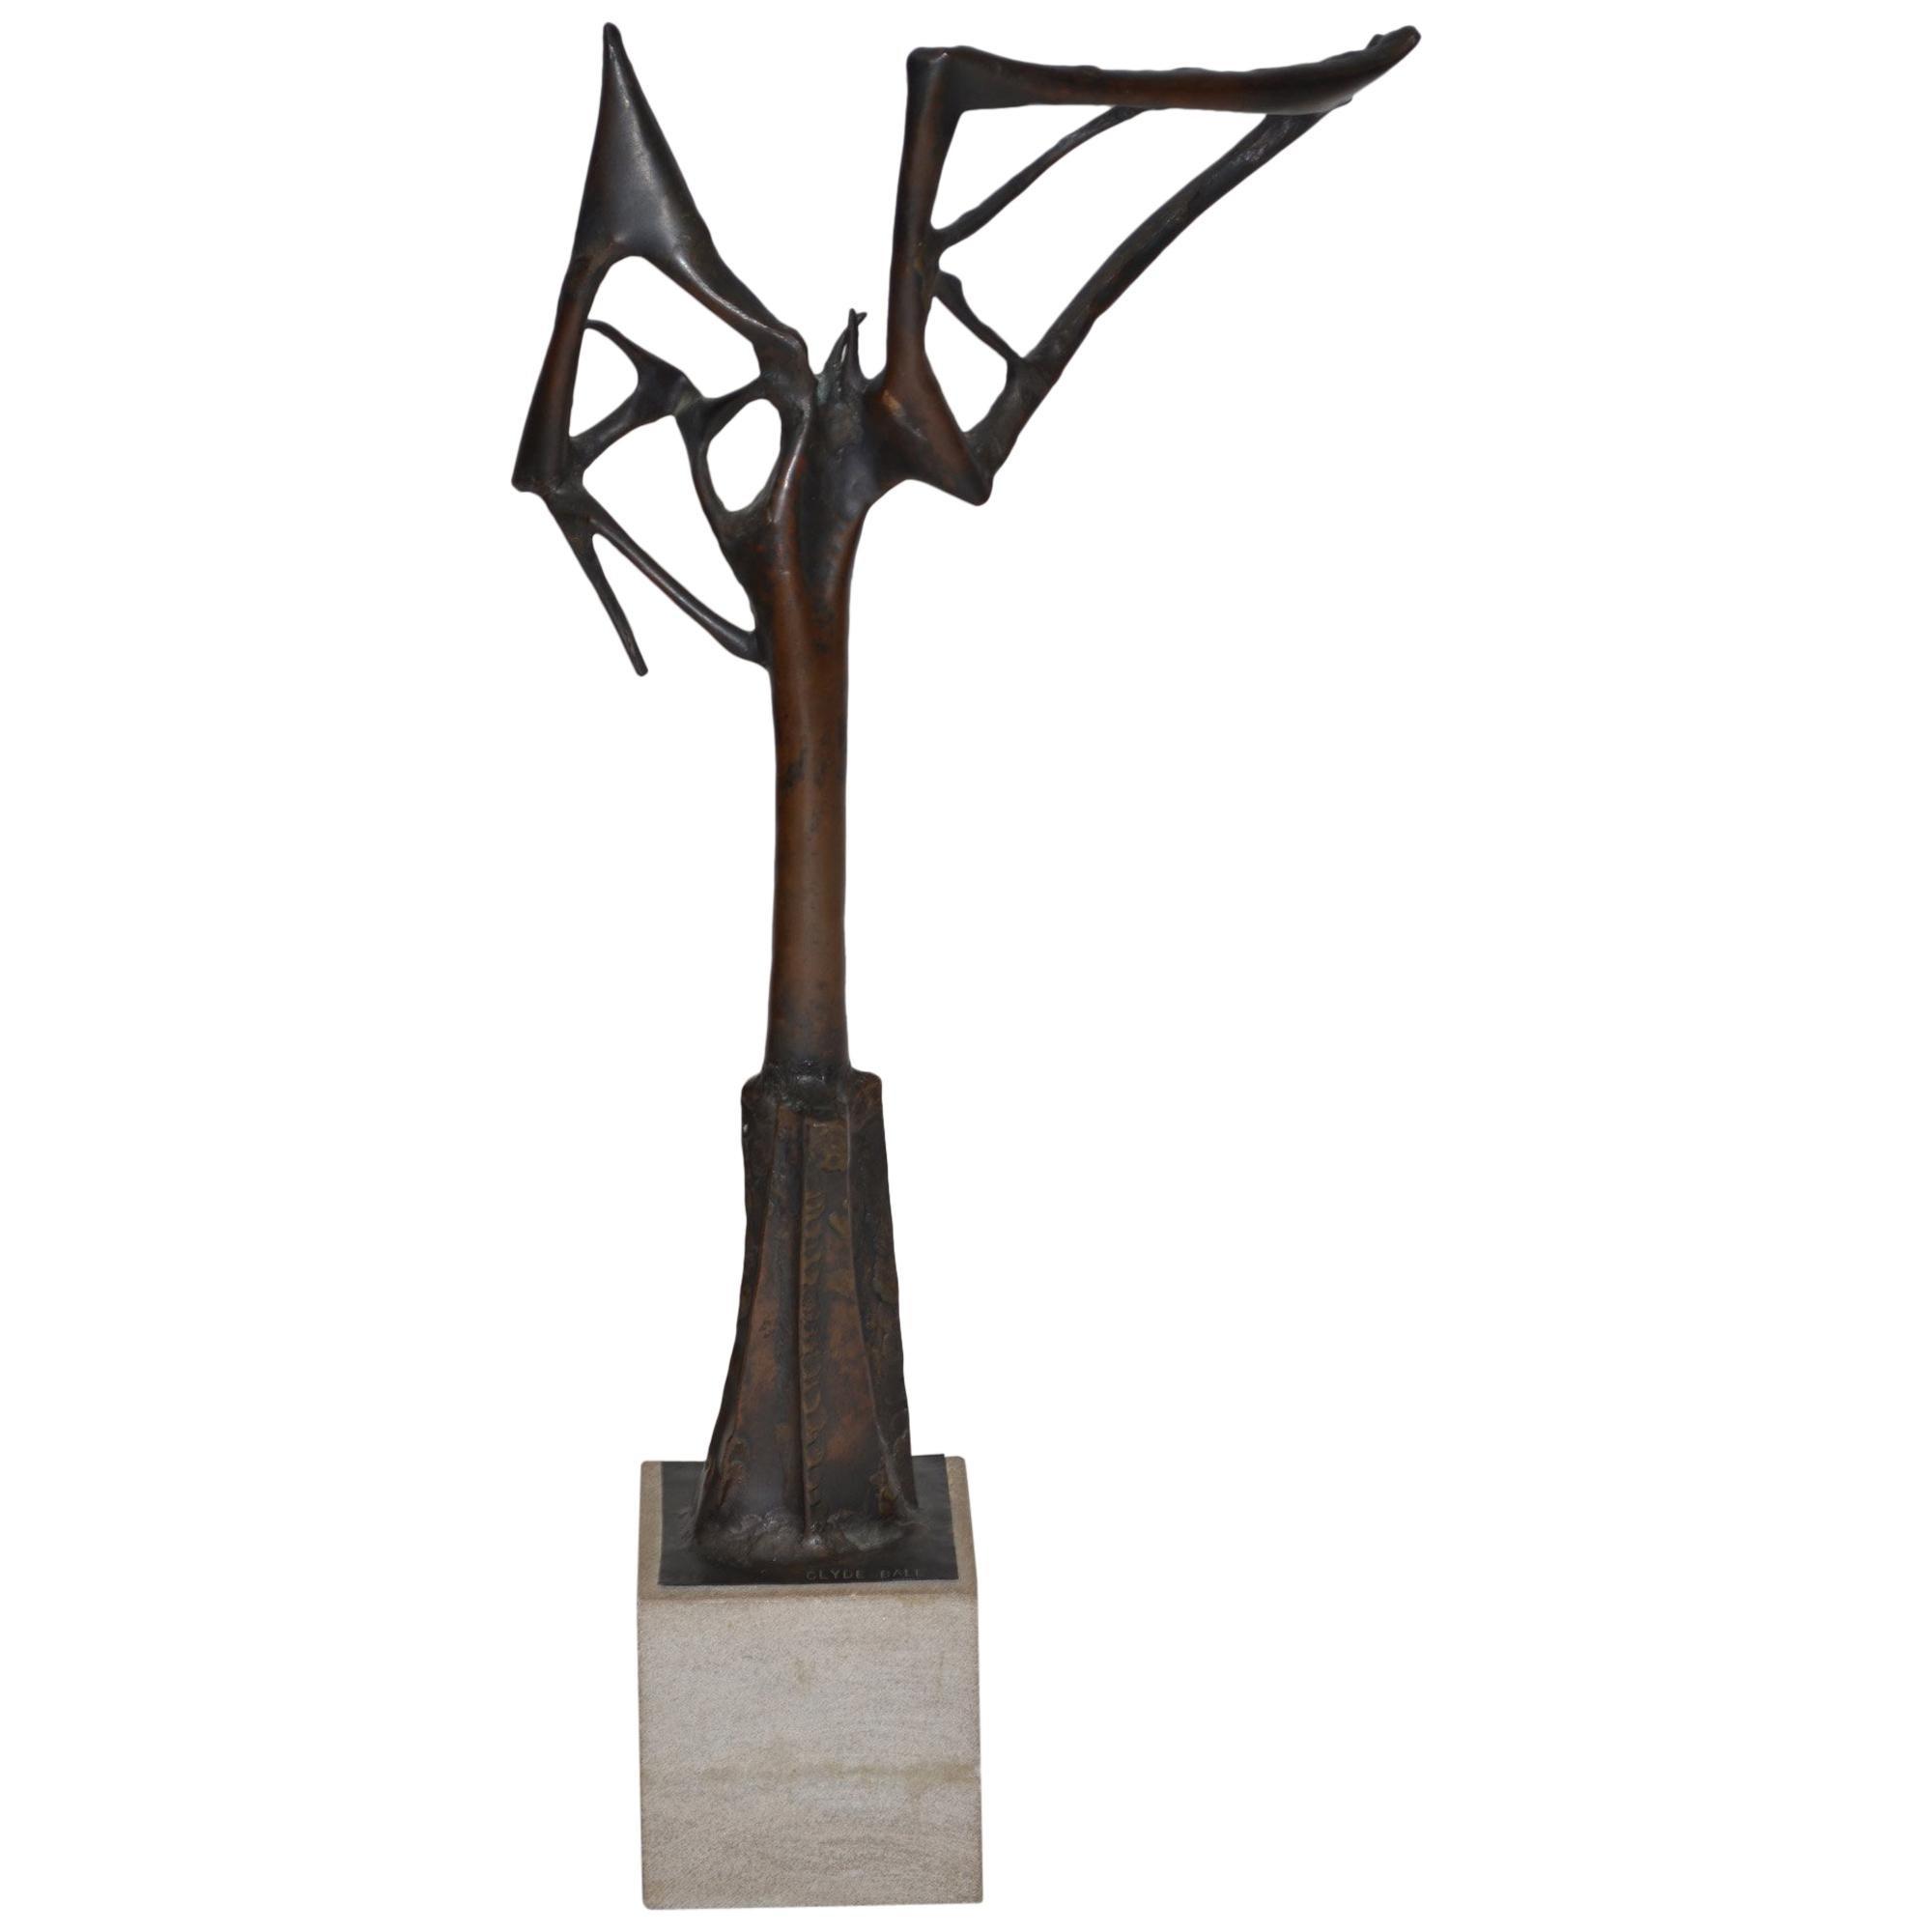 Abstract Bronze Brutalist Sculpture by Clyde Ball